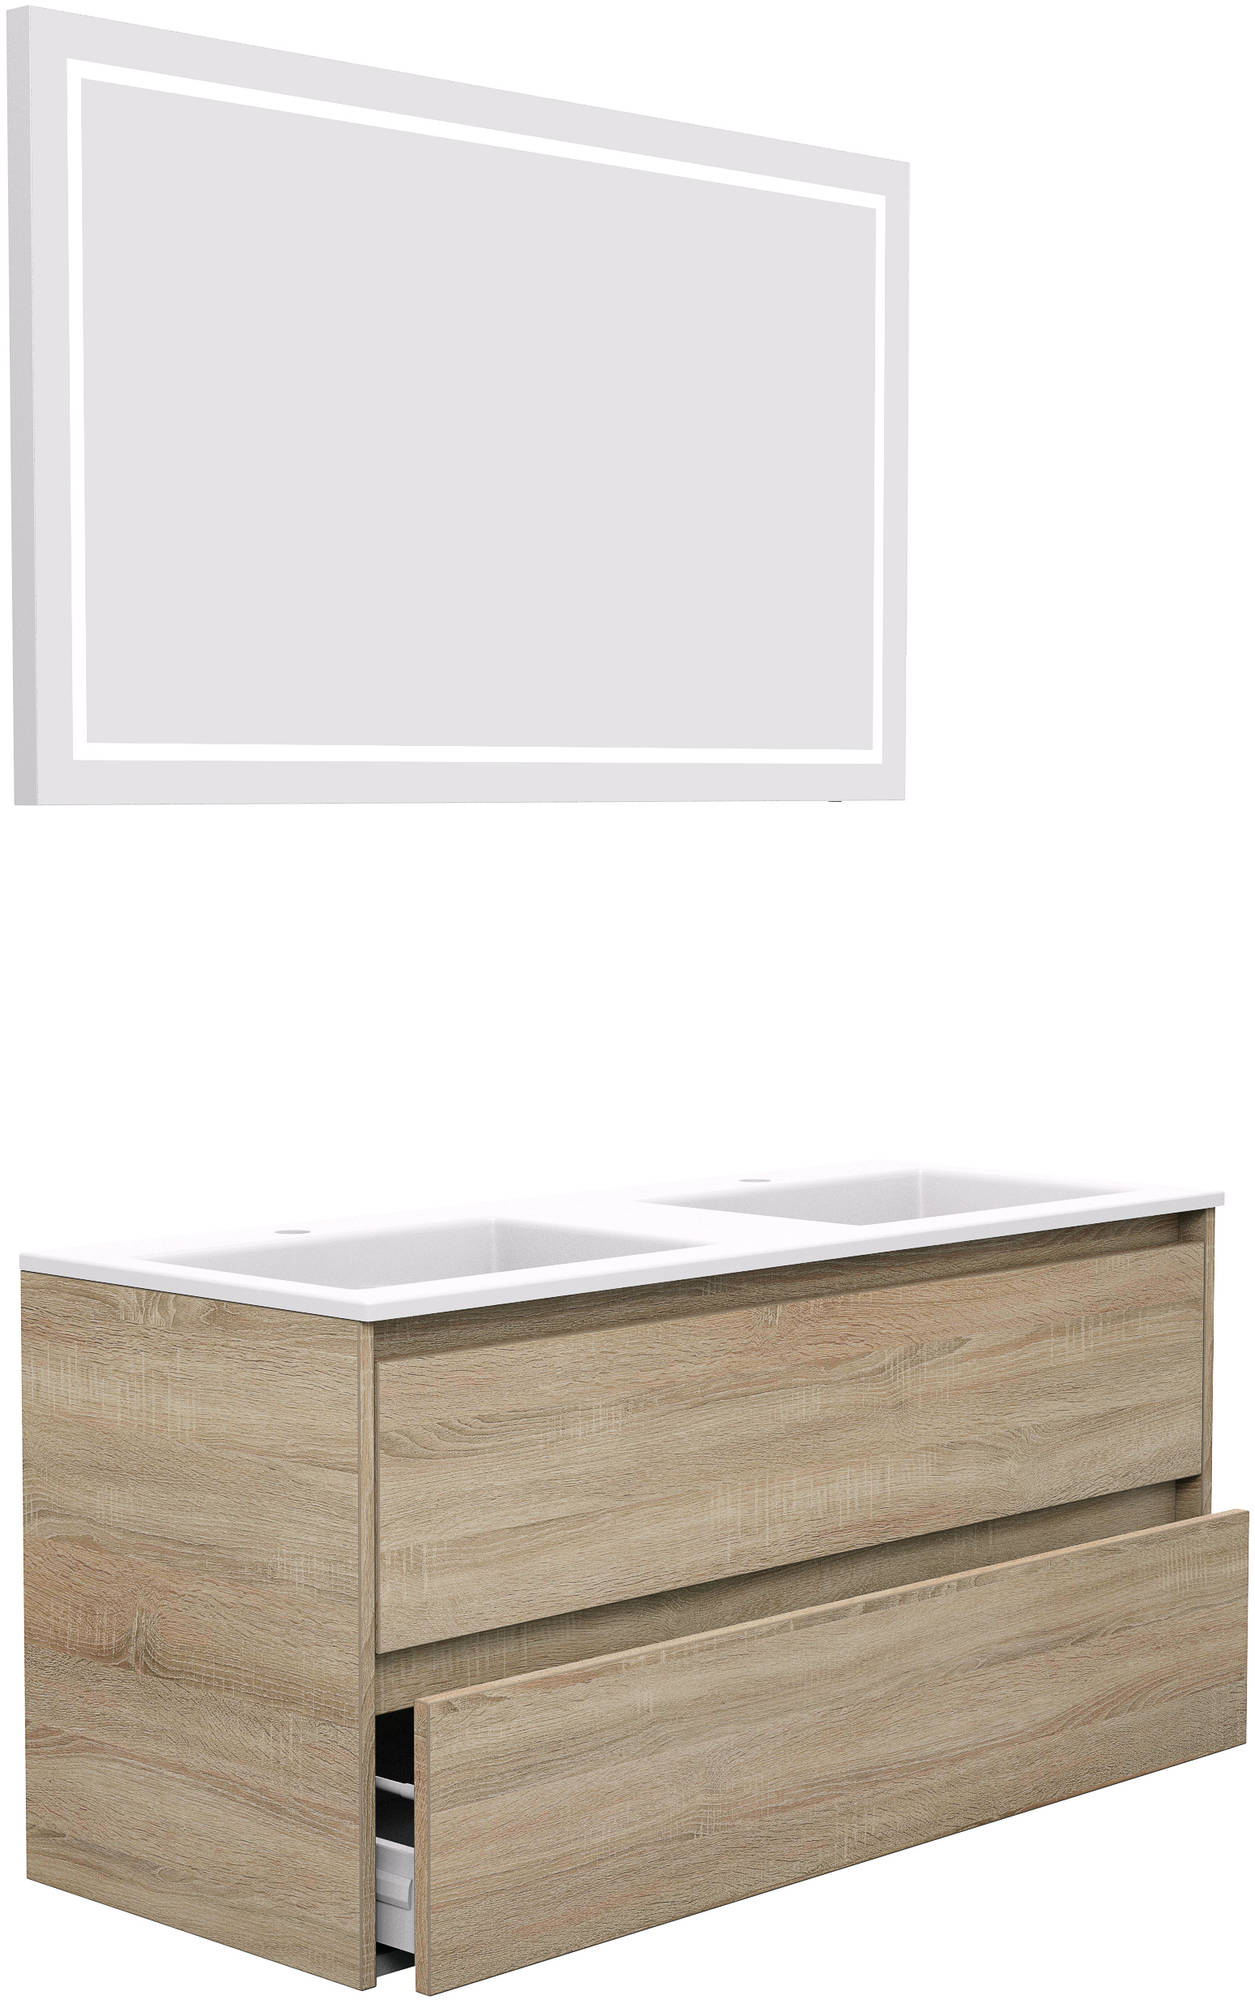 Primabad Dreamz Badkamermeubelset 120x47 cm  Stone Grey